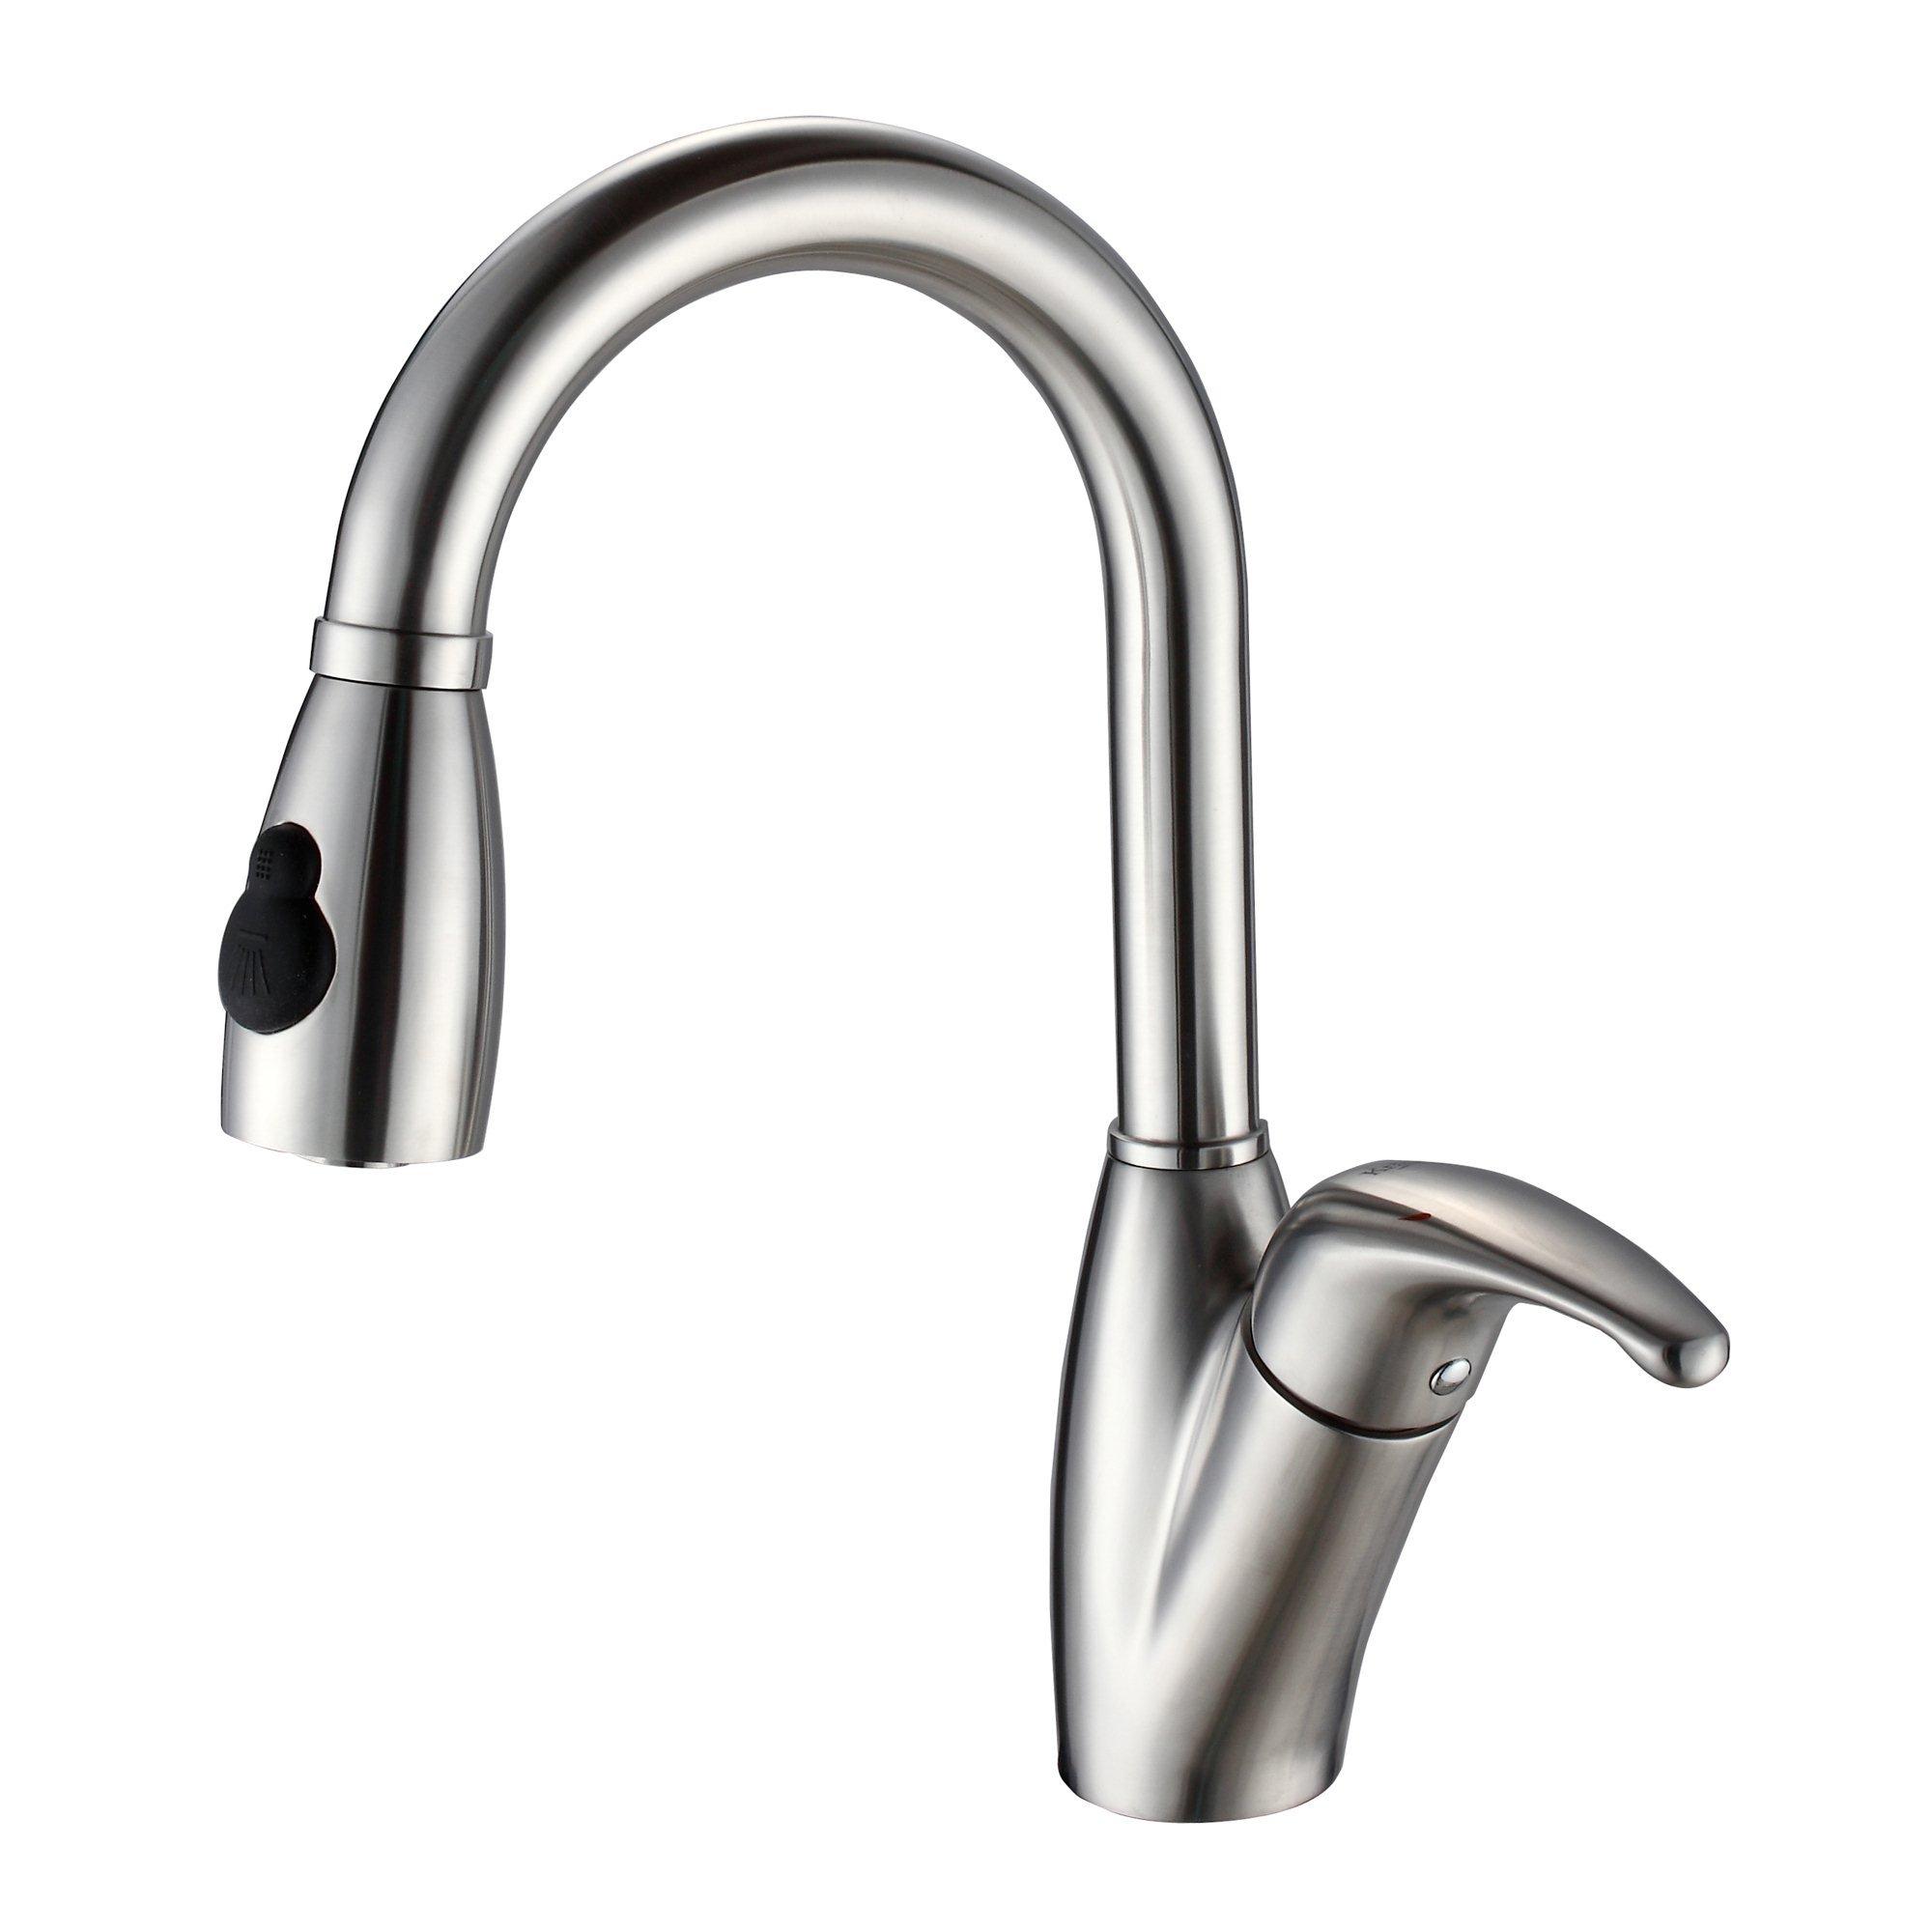 Kraus KEA-14445BN Aura Bathroom Accessories - Shelf with Railing Brushed Nickel by Kraus (Image #9)